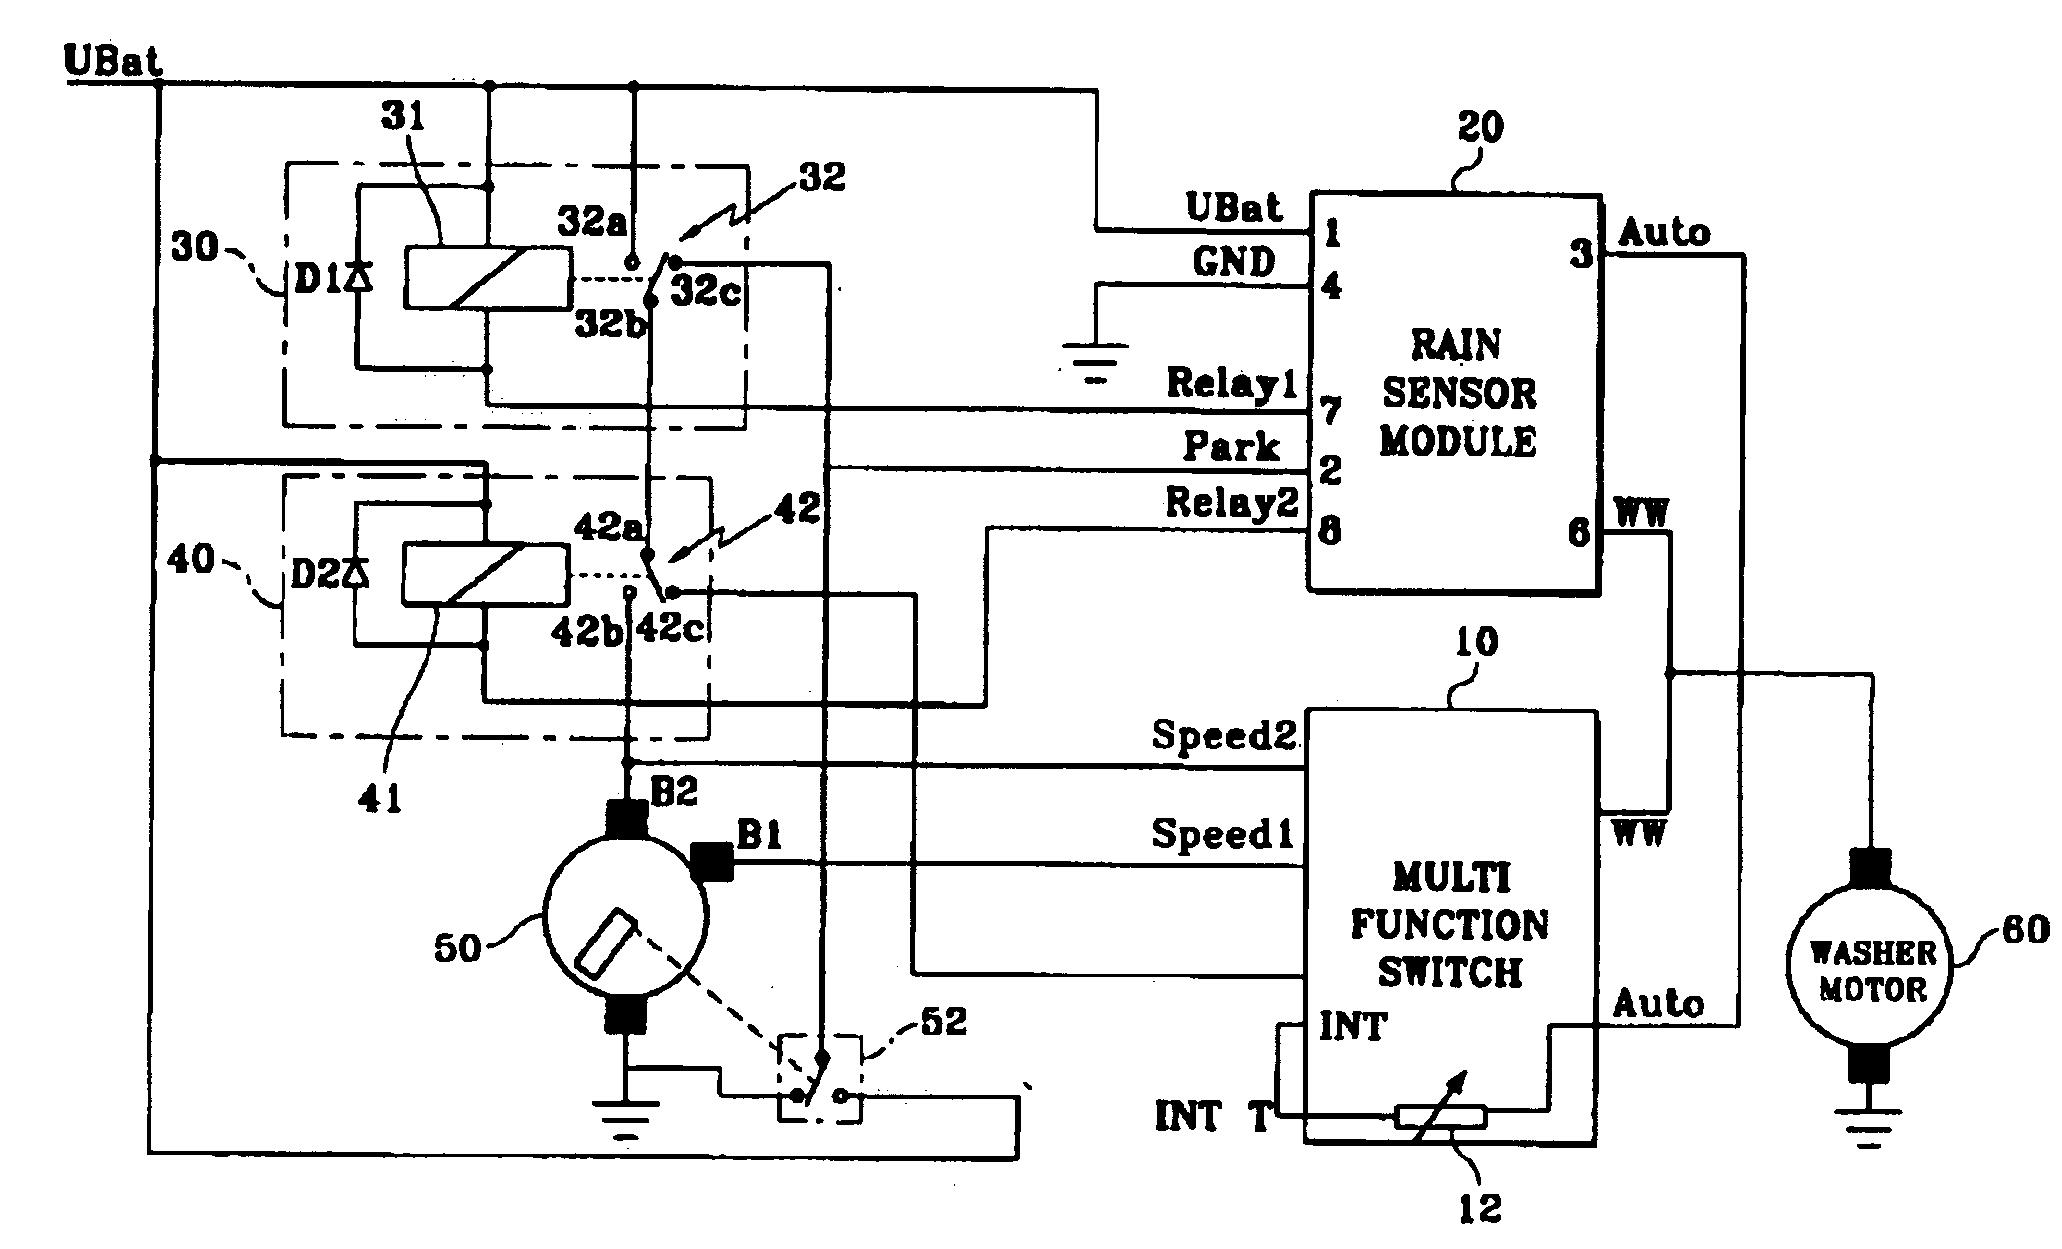 Free 2009 Mazda 6 Stereo Wiring Diagram Auto Electrical 2004 Fuse 08 3 Rain Sensor 37